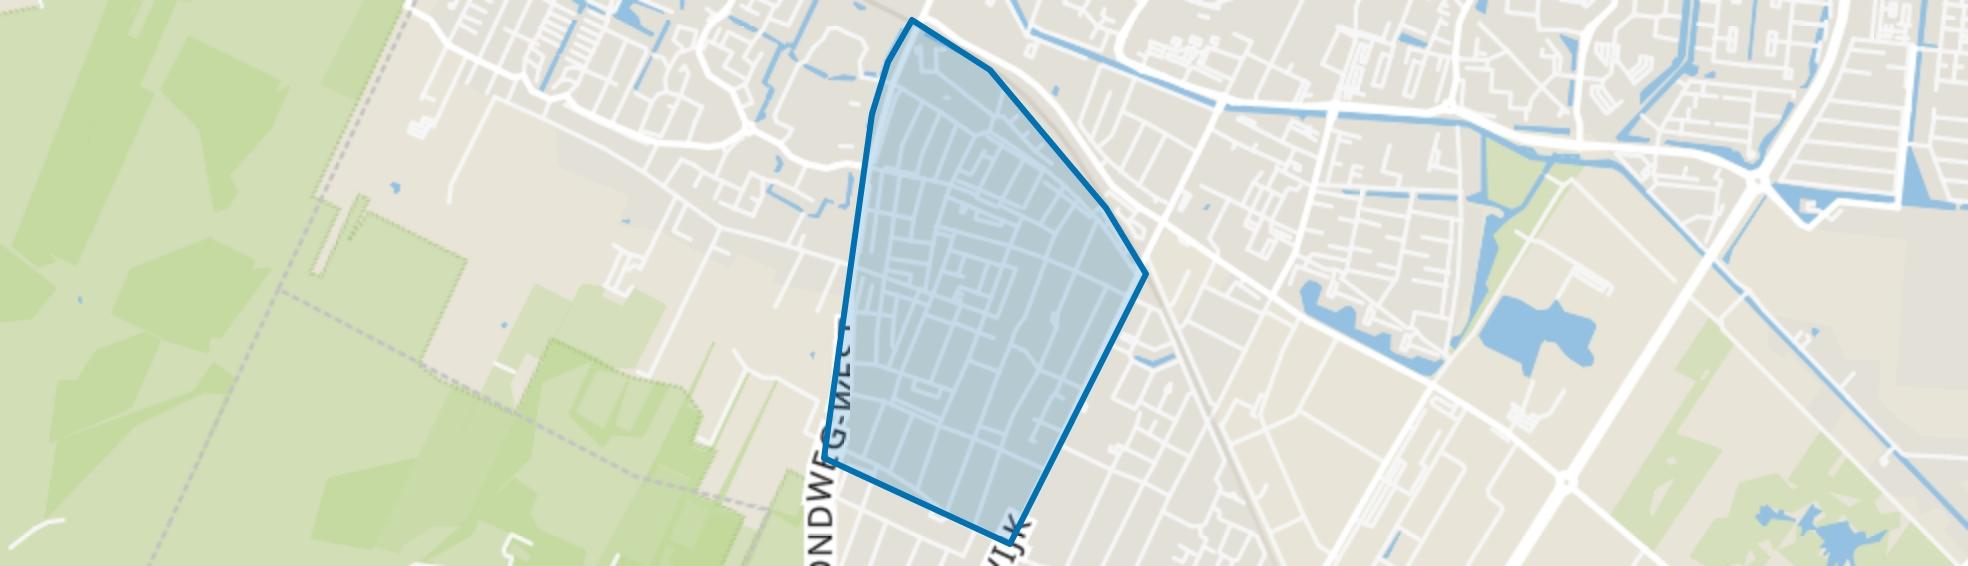 Franse Gat, Veenendaal map